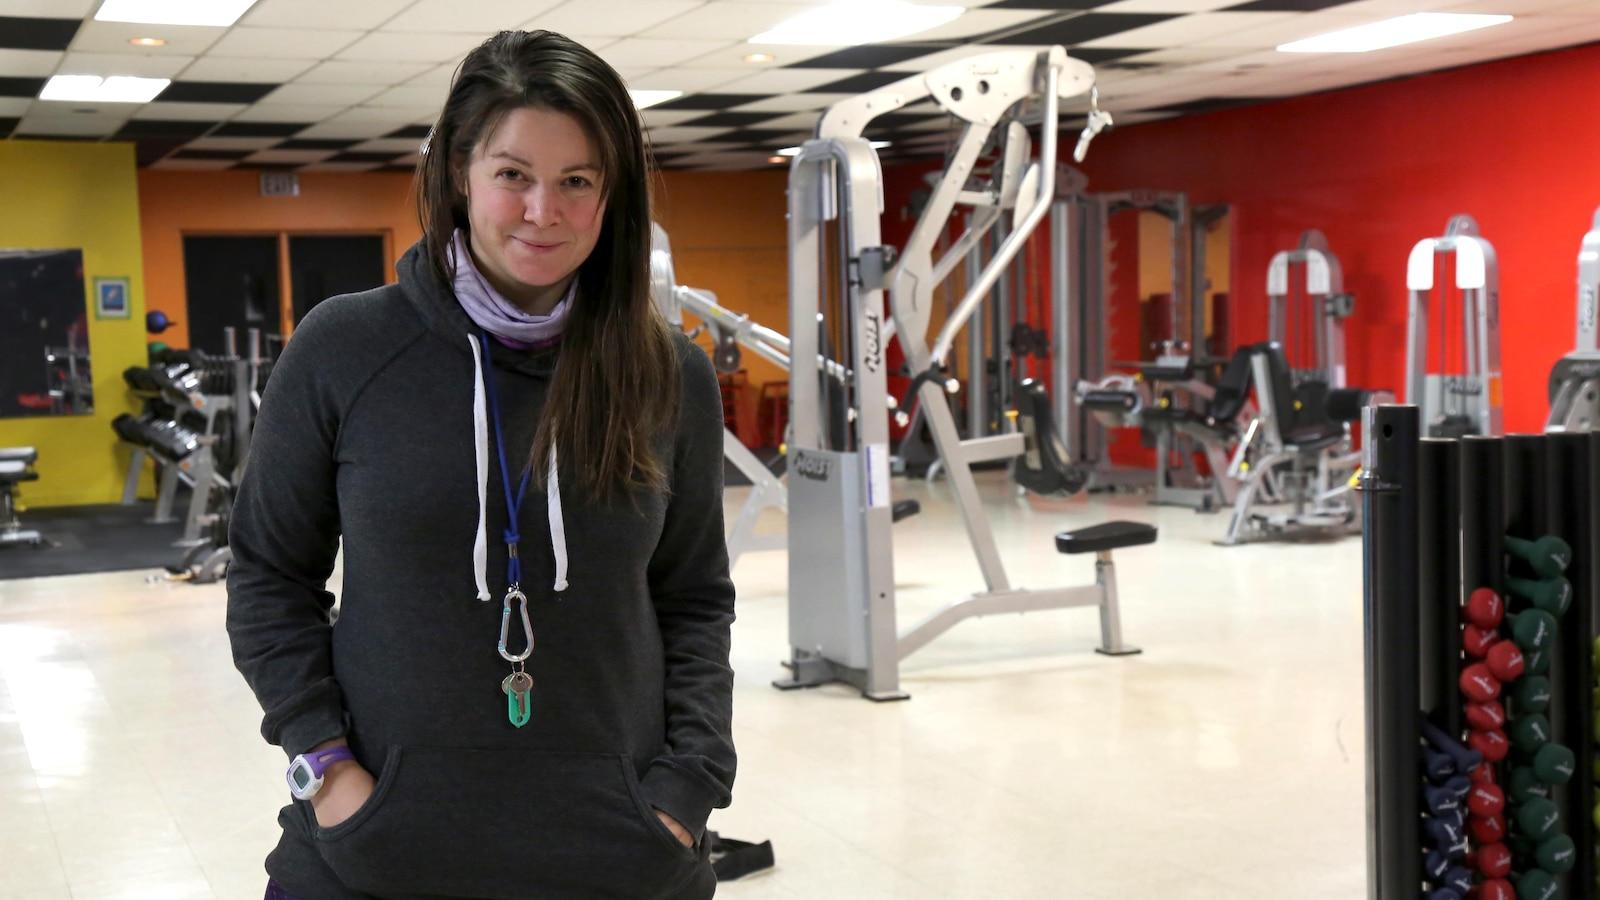 L'enseignante Maggie MacDonnell